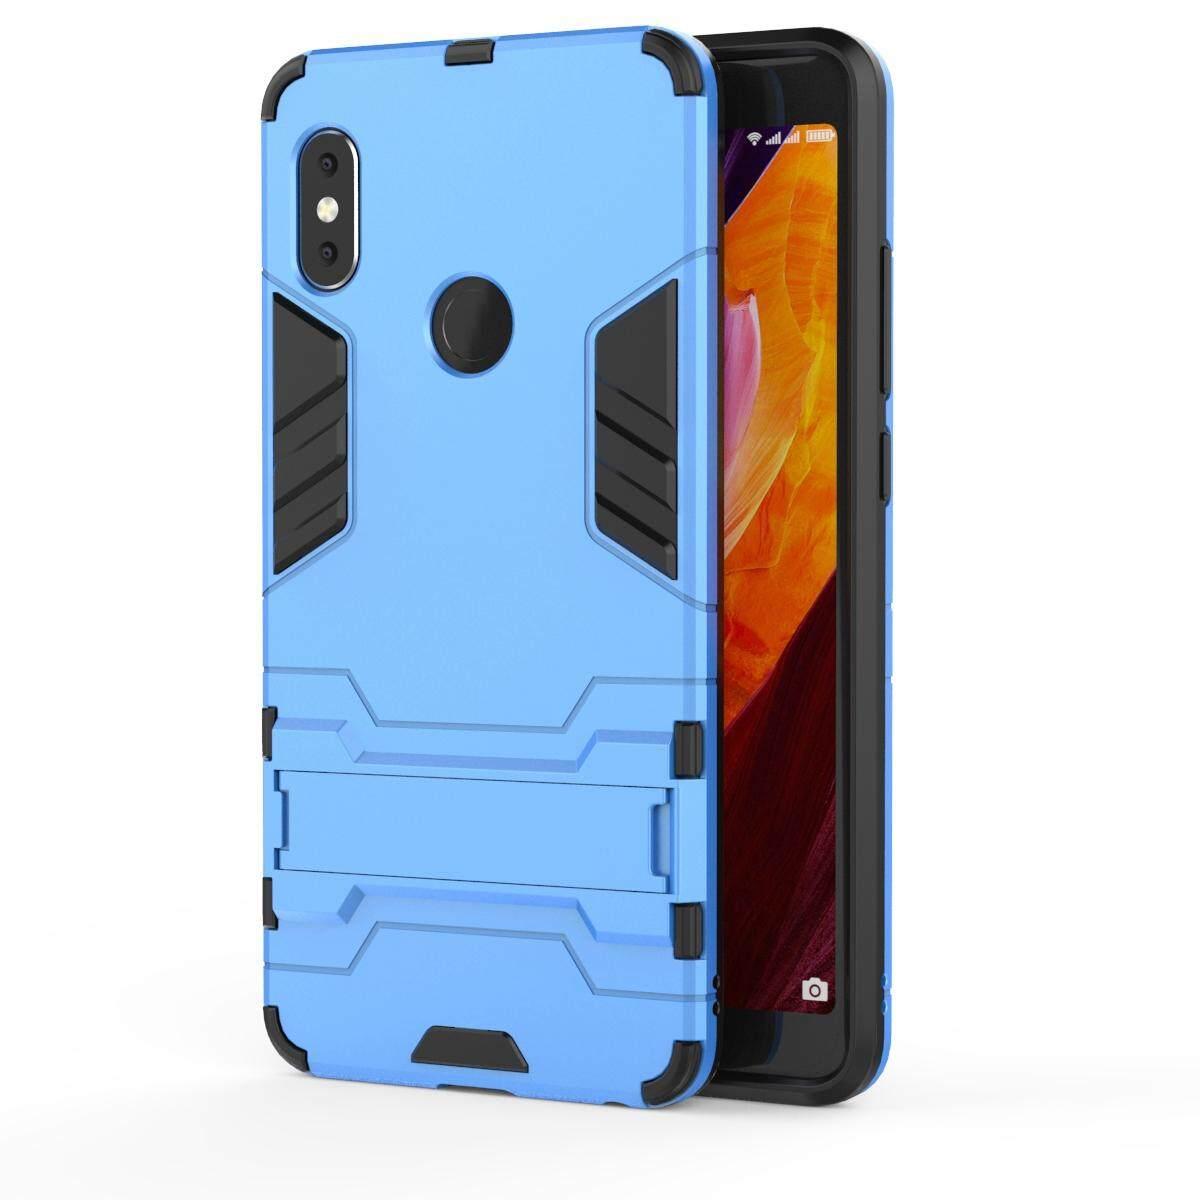 Hicase for XiaoMi Redmi Note 5 (5.99inch) Detachable 2 in 1 Hybrid Armor